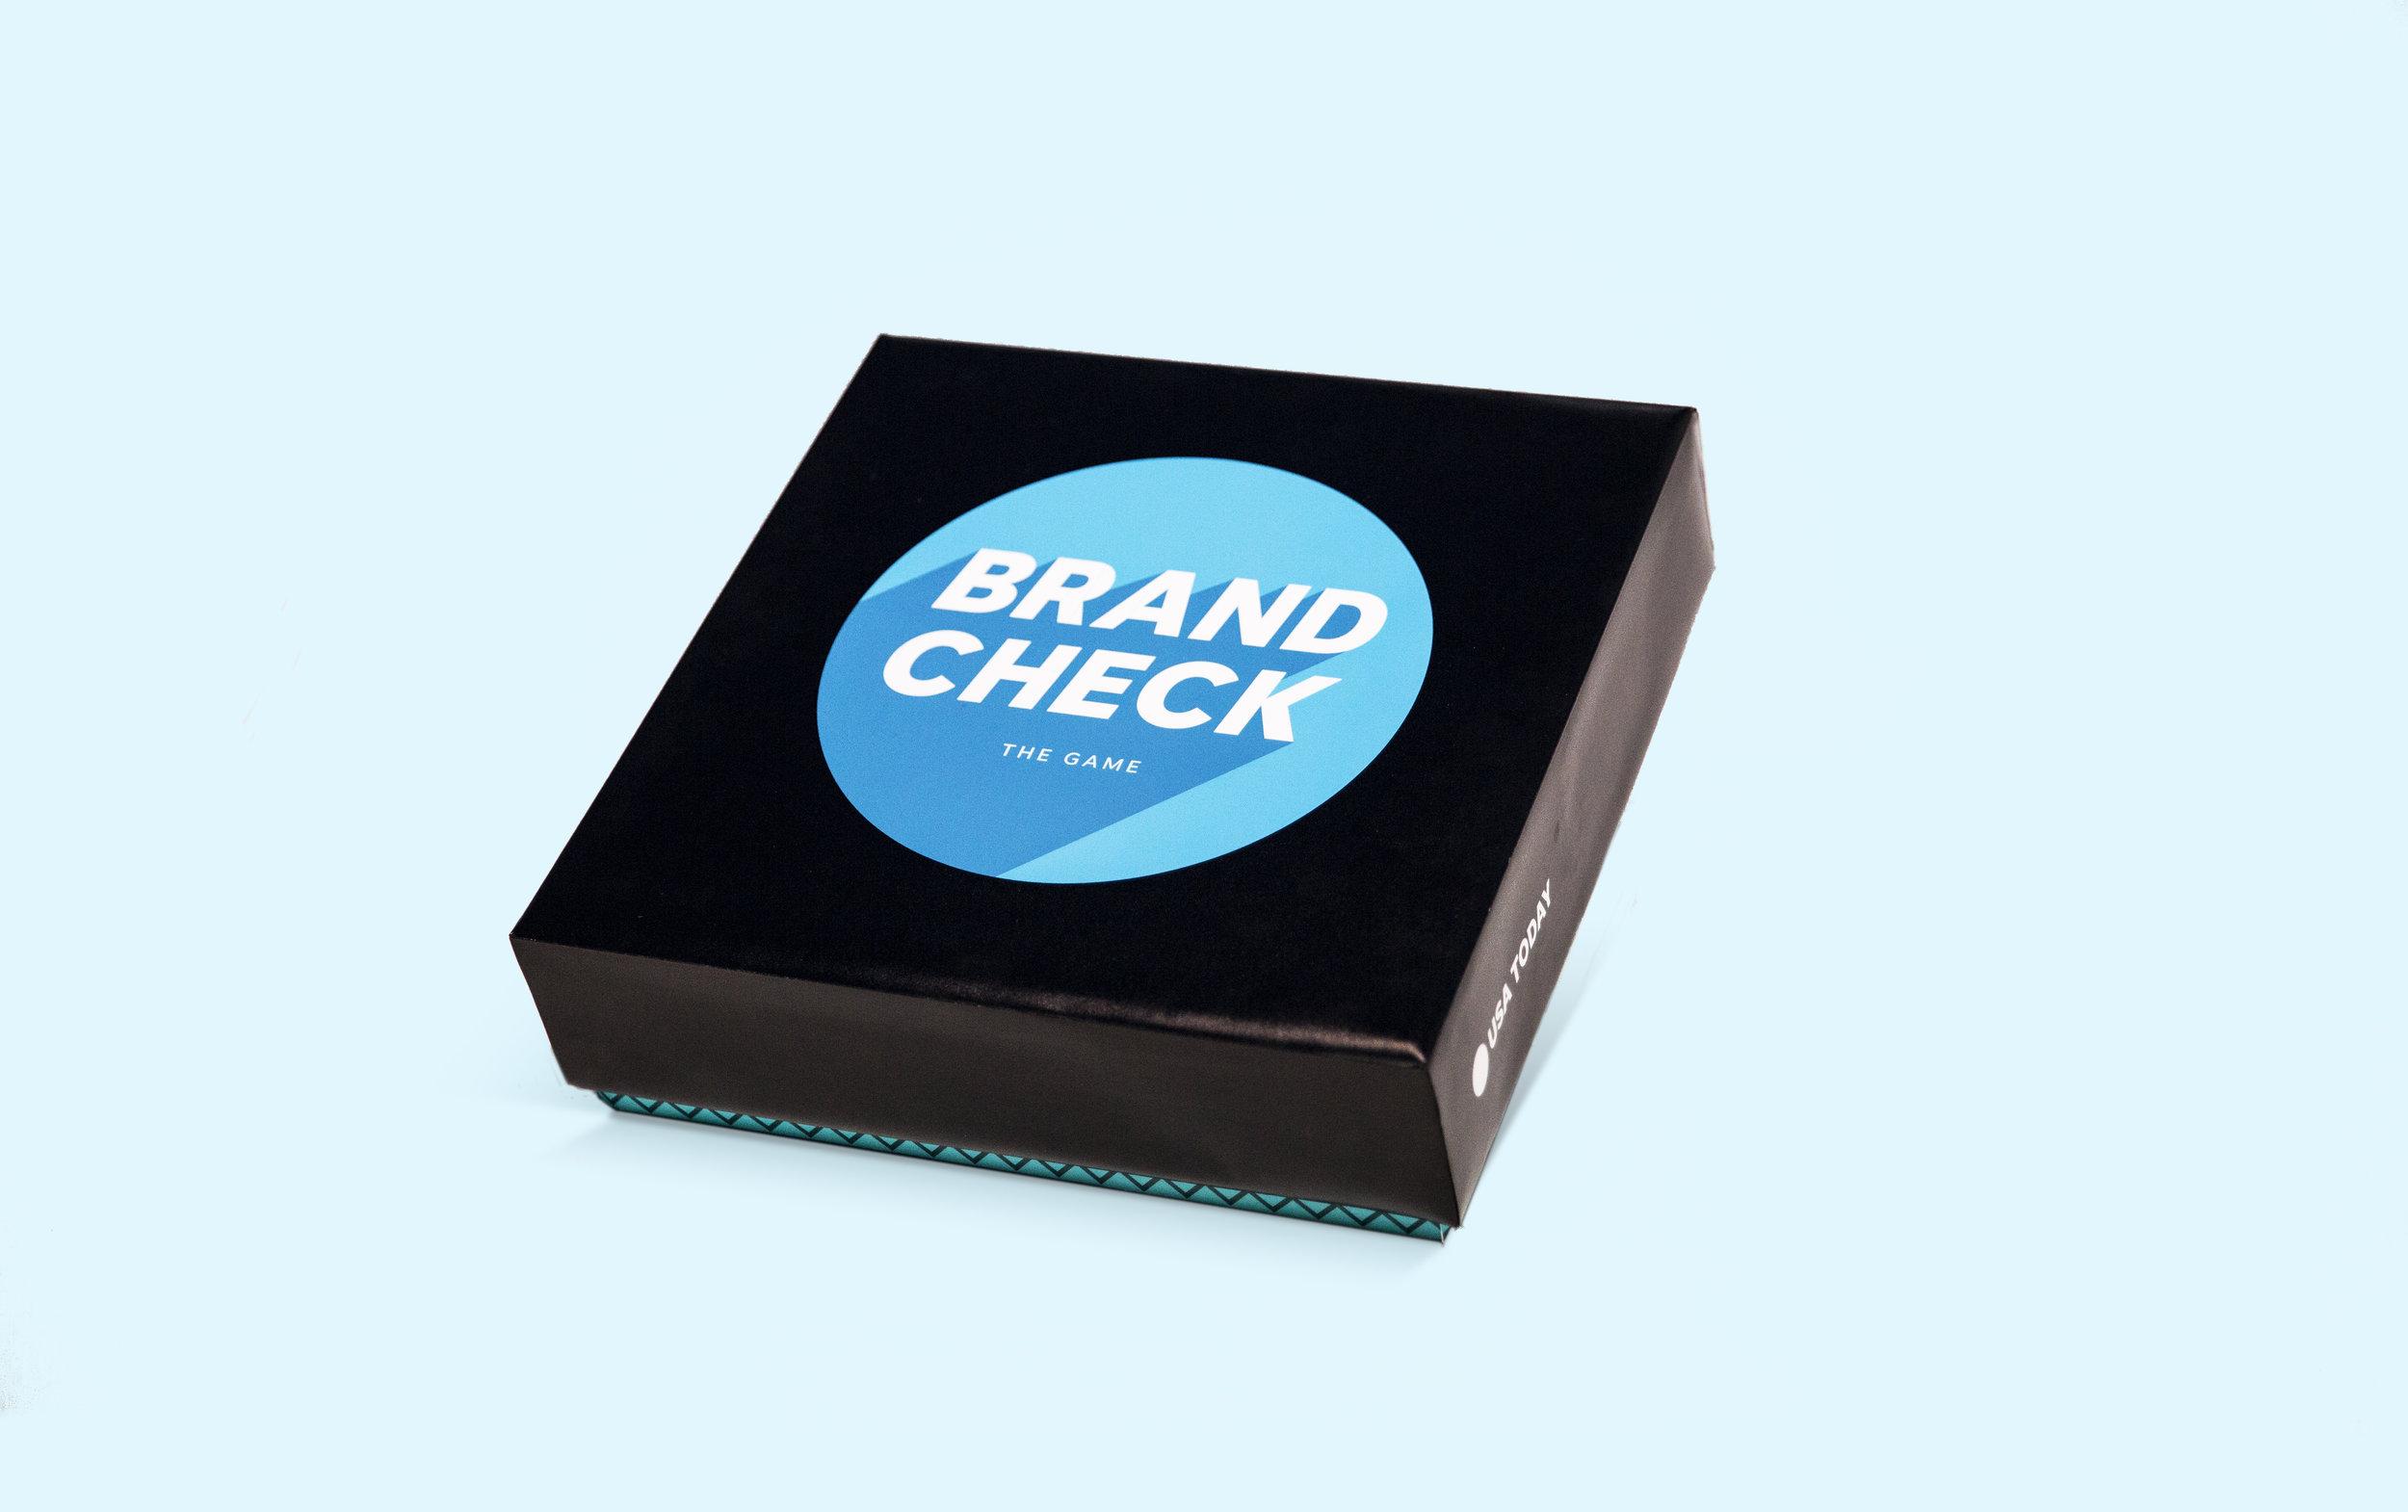 BrandCheck_BoxCover.jpg